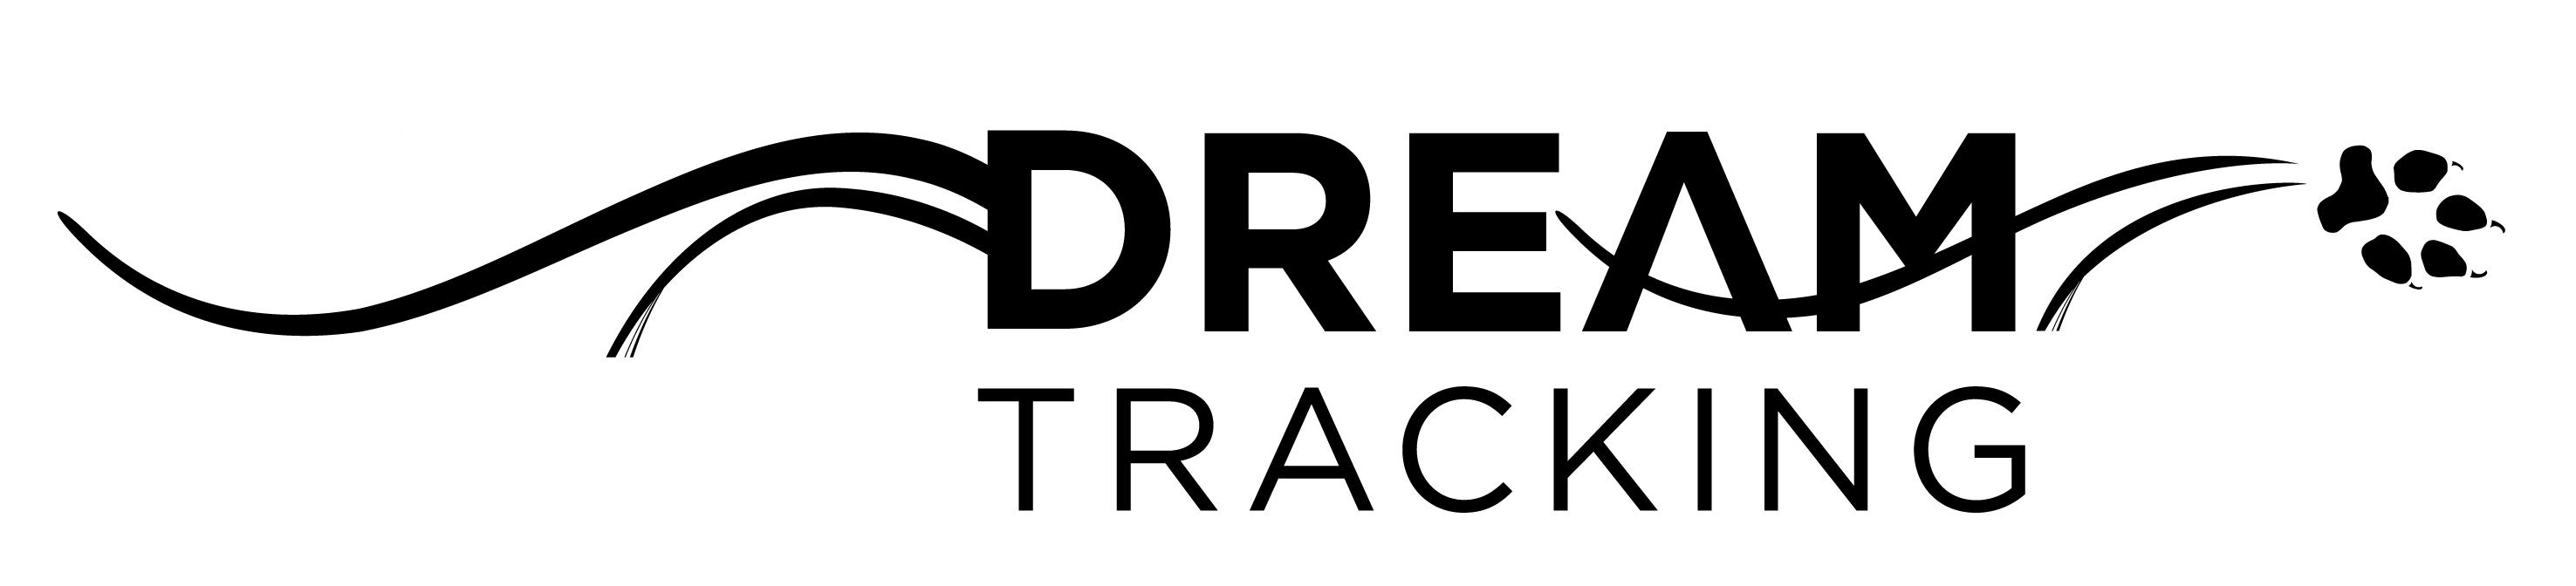 Dream Tracking